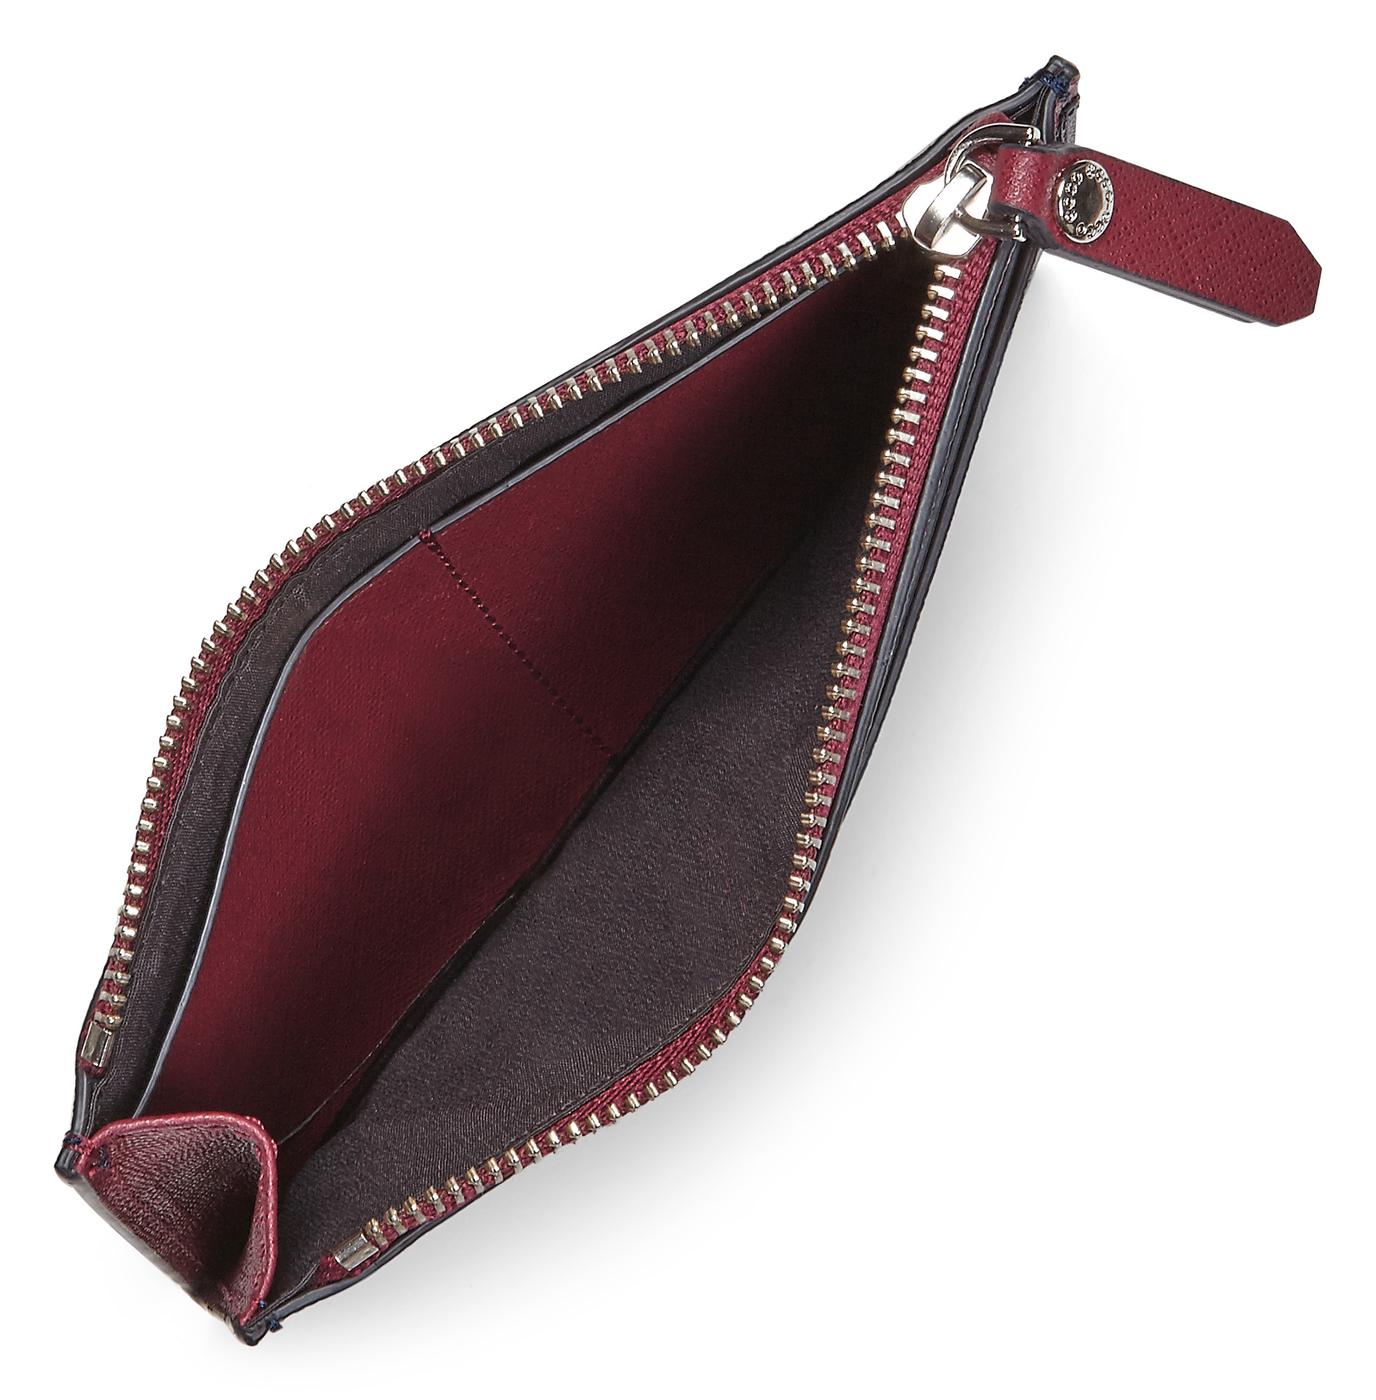 Petit portefeuille de voyage ECCO Iola